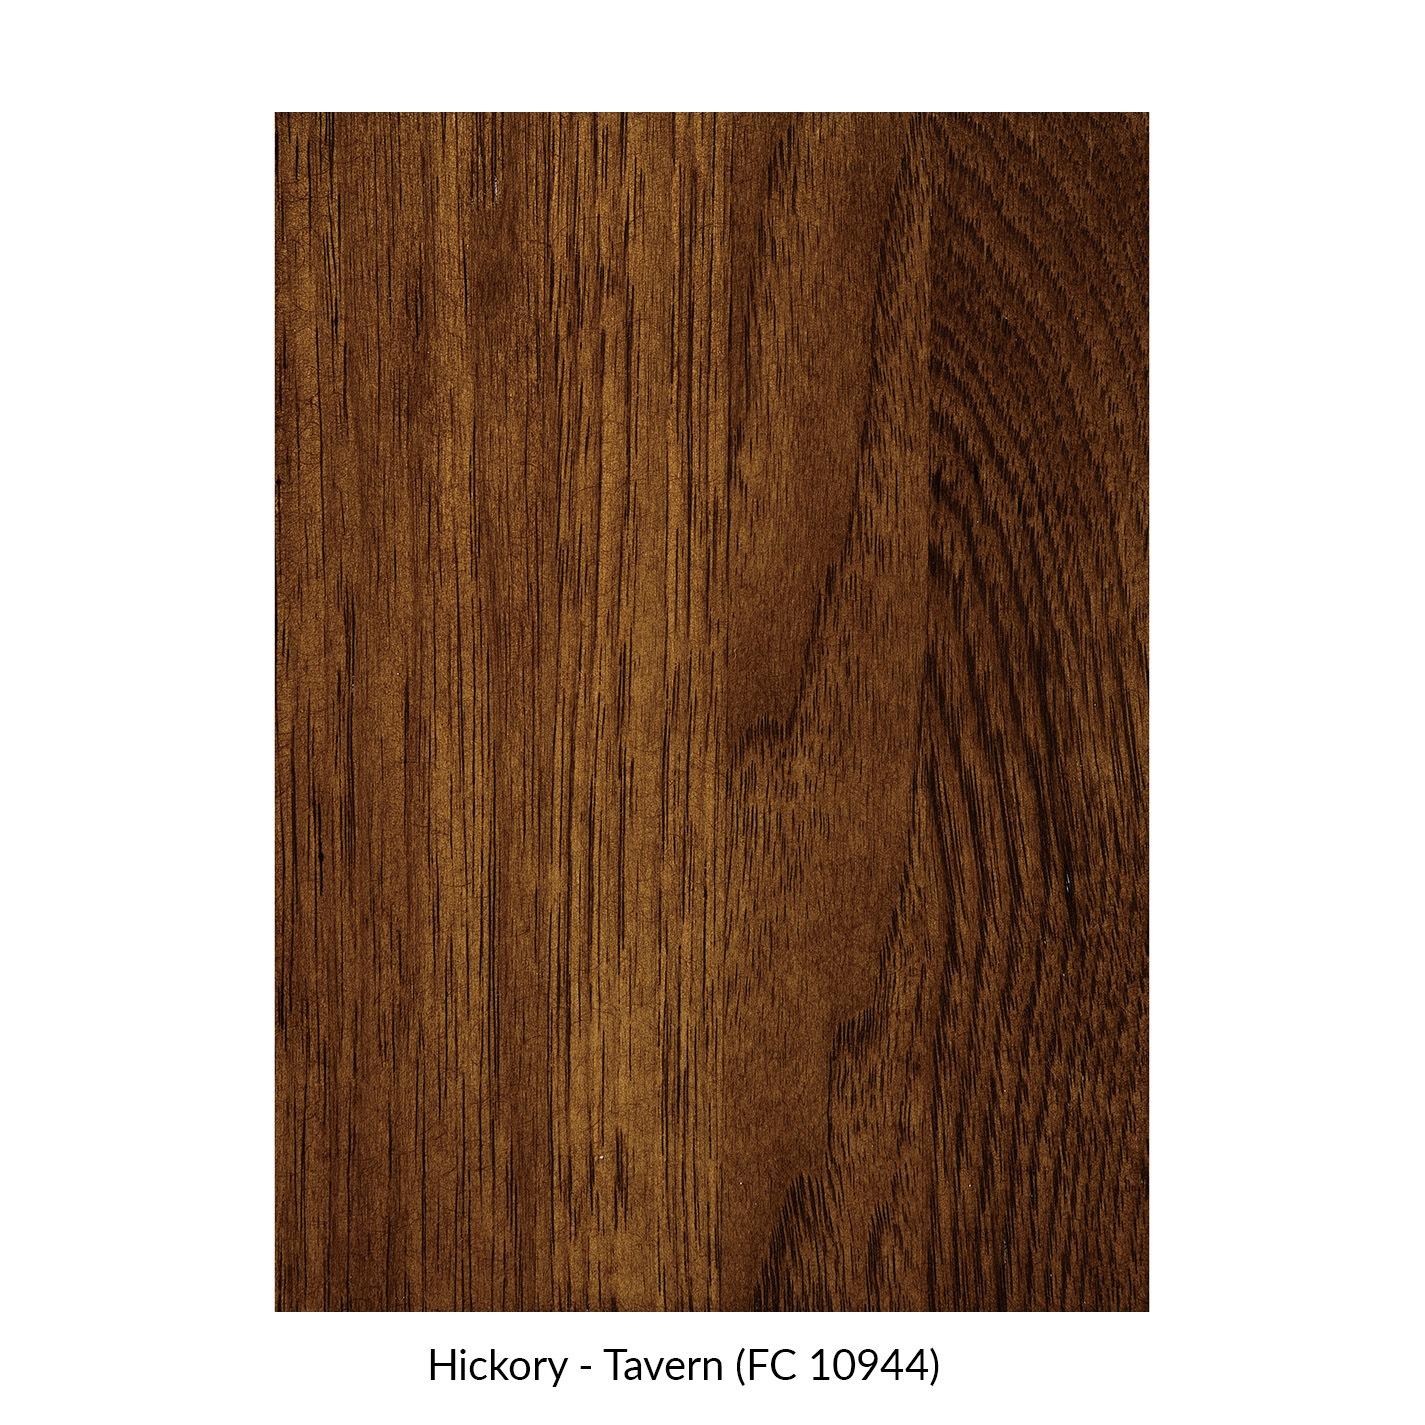 spectrum-hickory-tavern-fc-10944.jpg